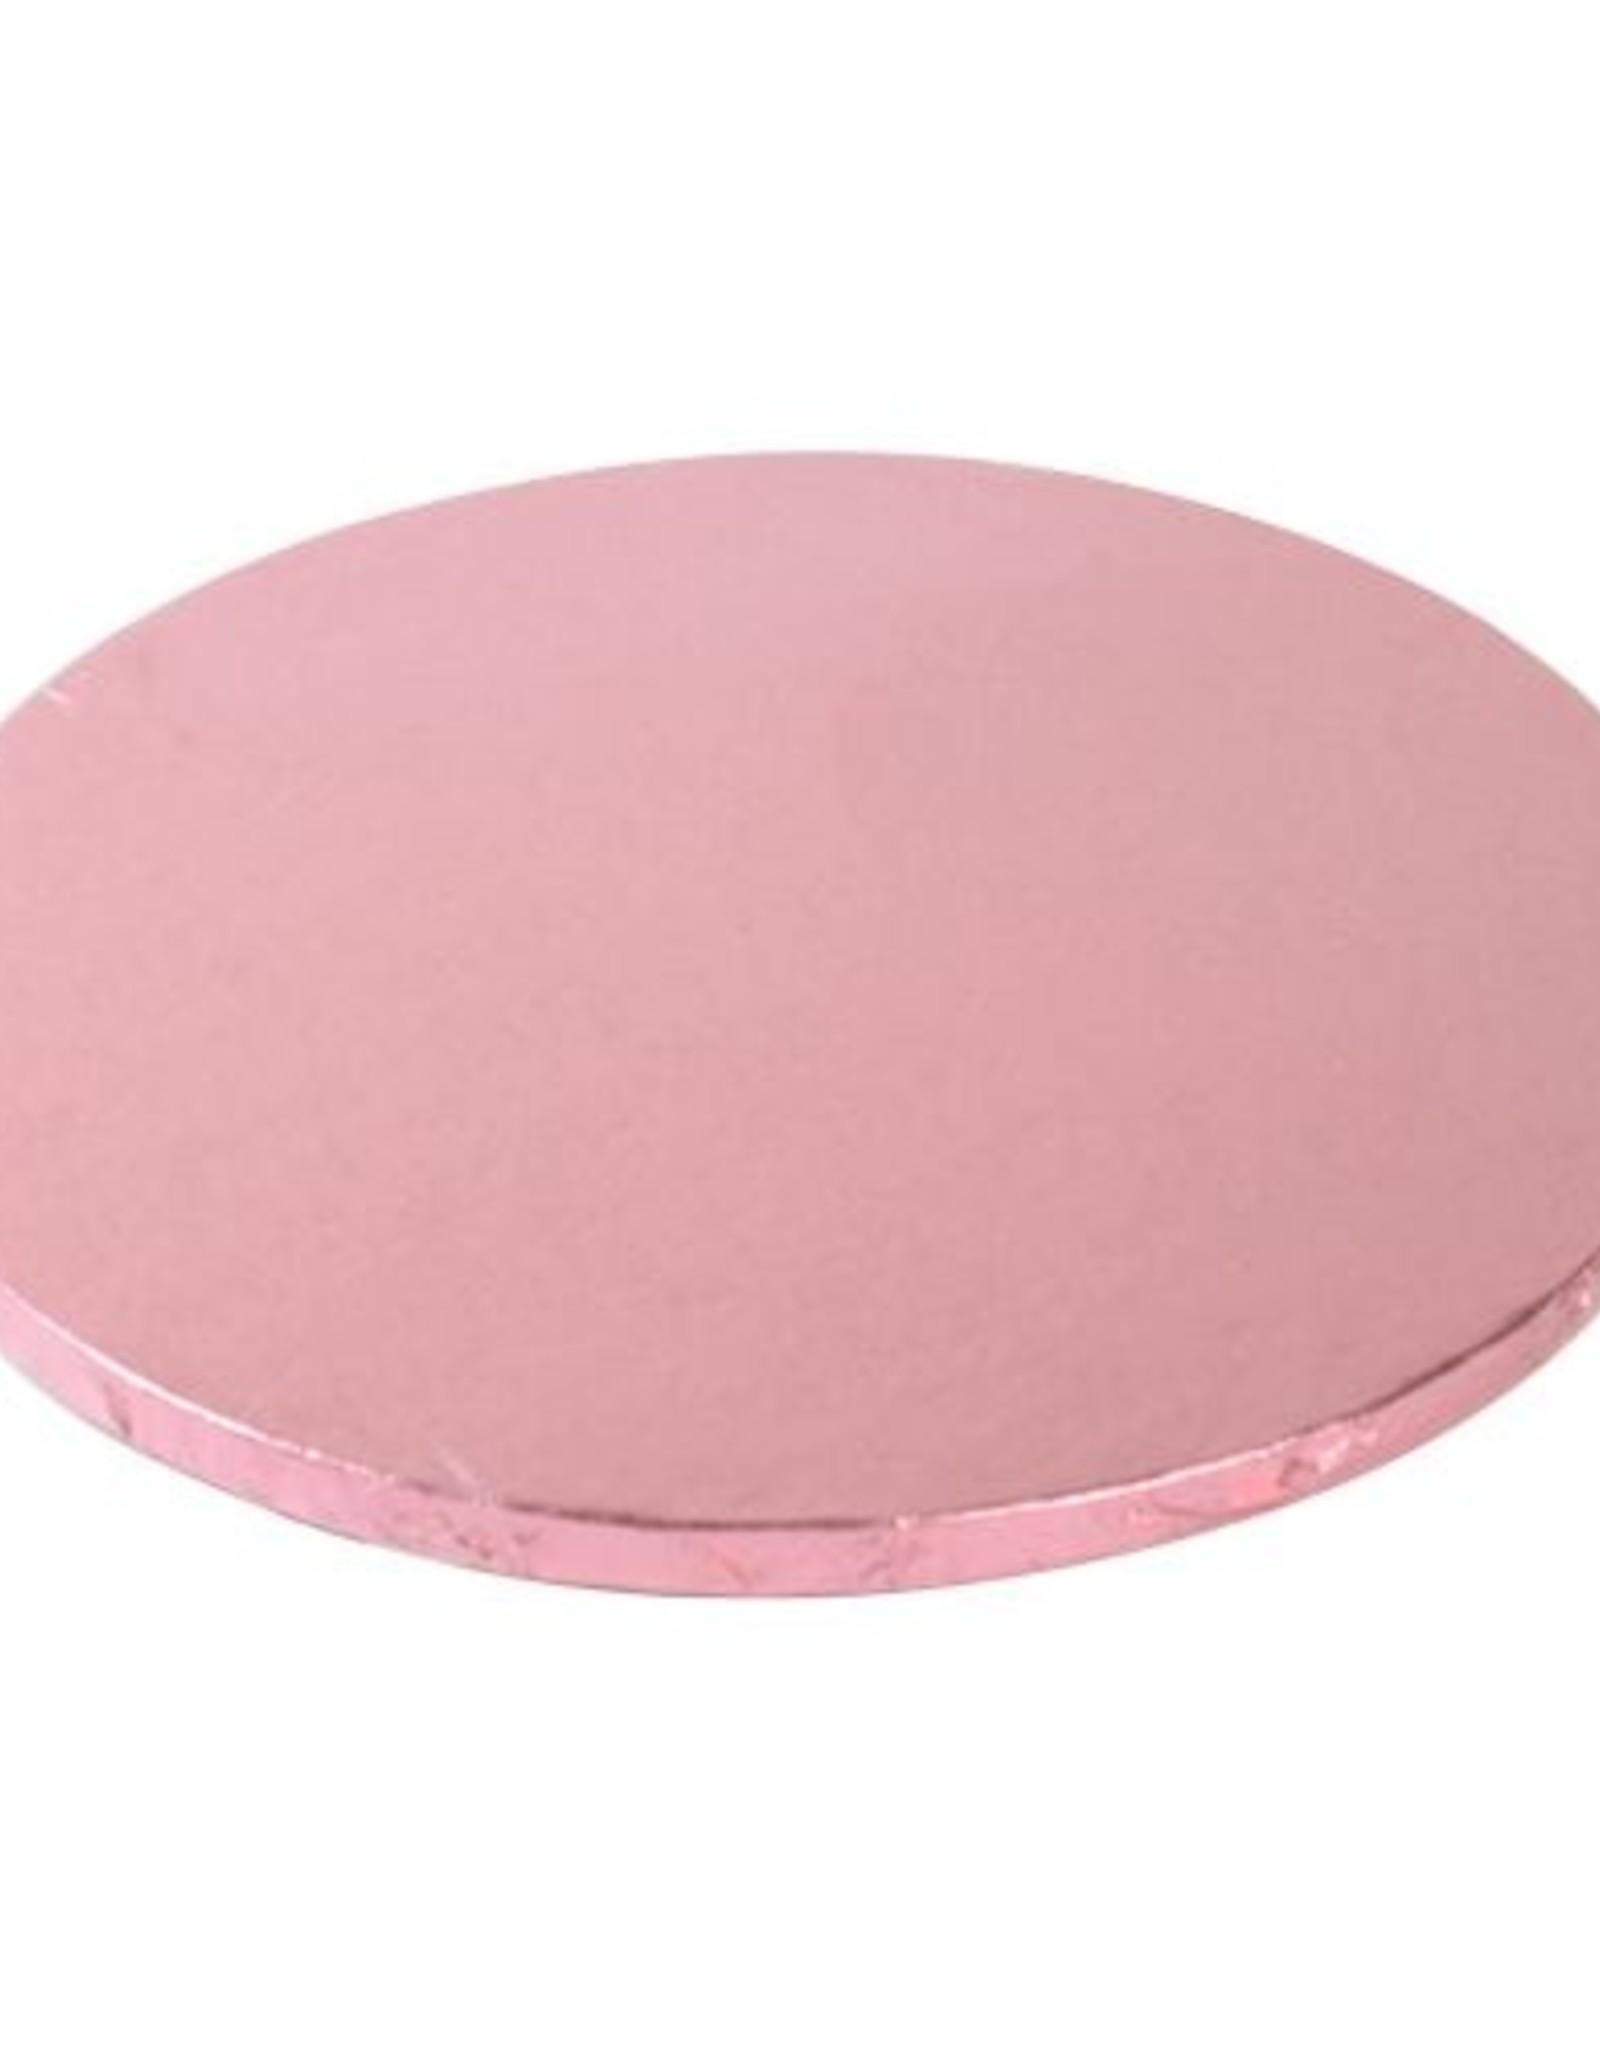 Decora Cake Drum Rond Ø30,5cm Roze